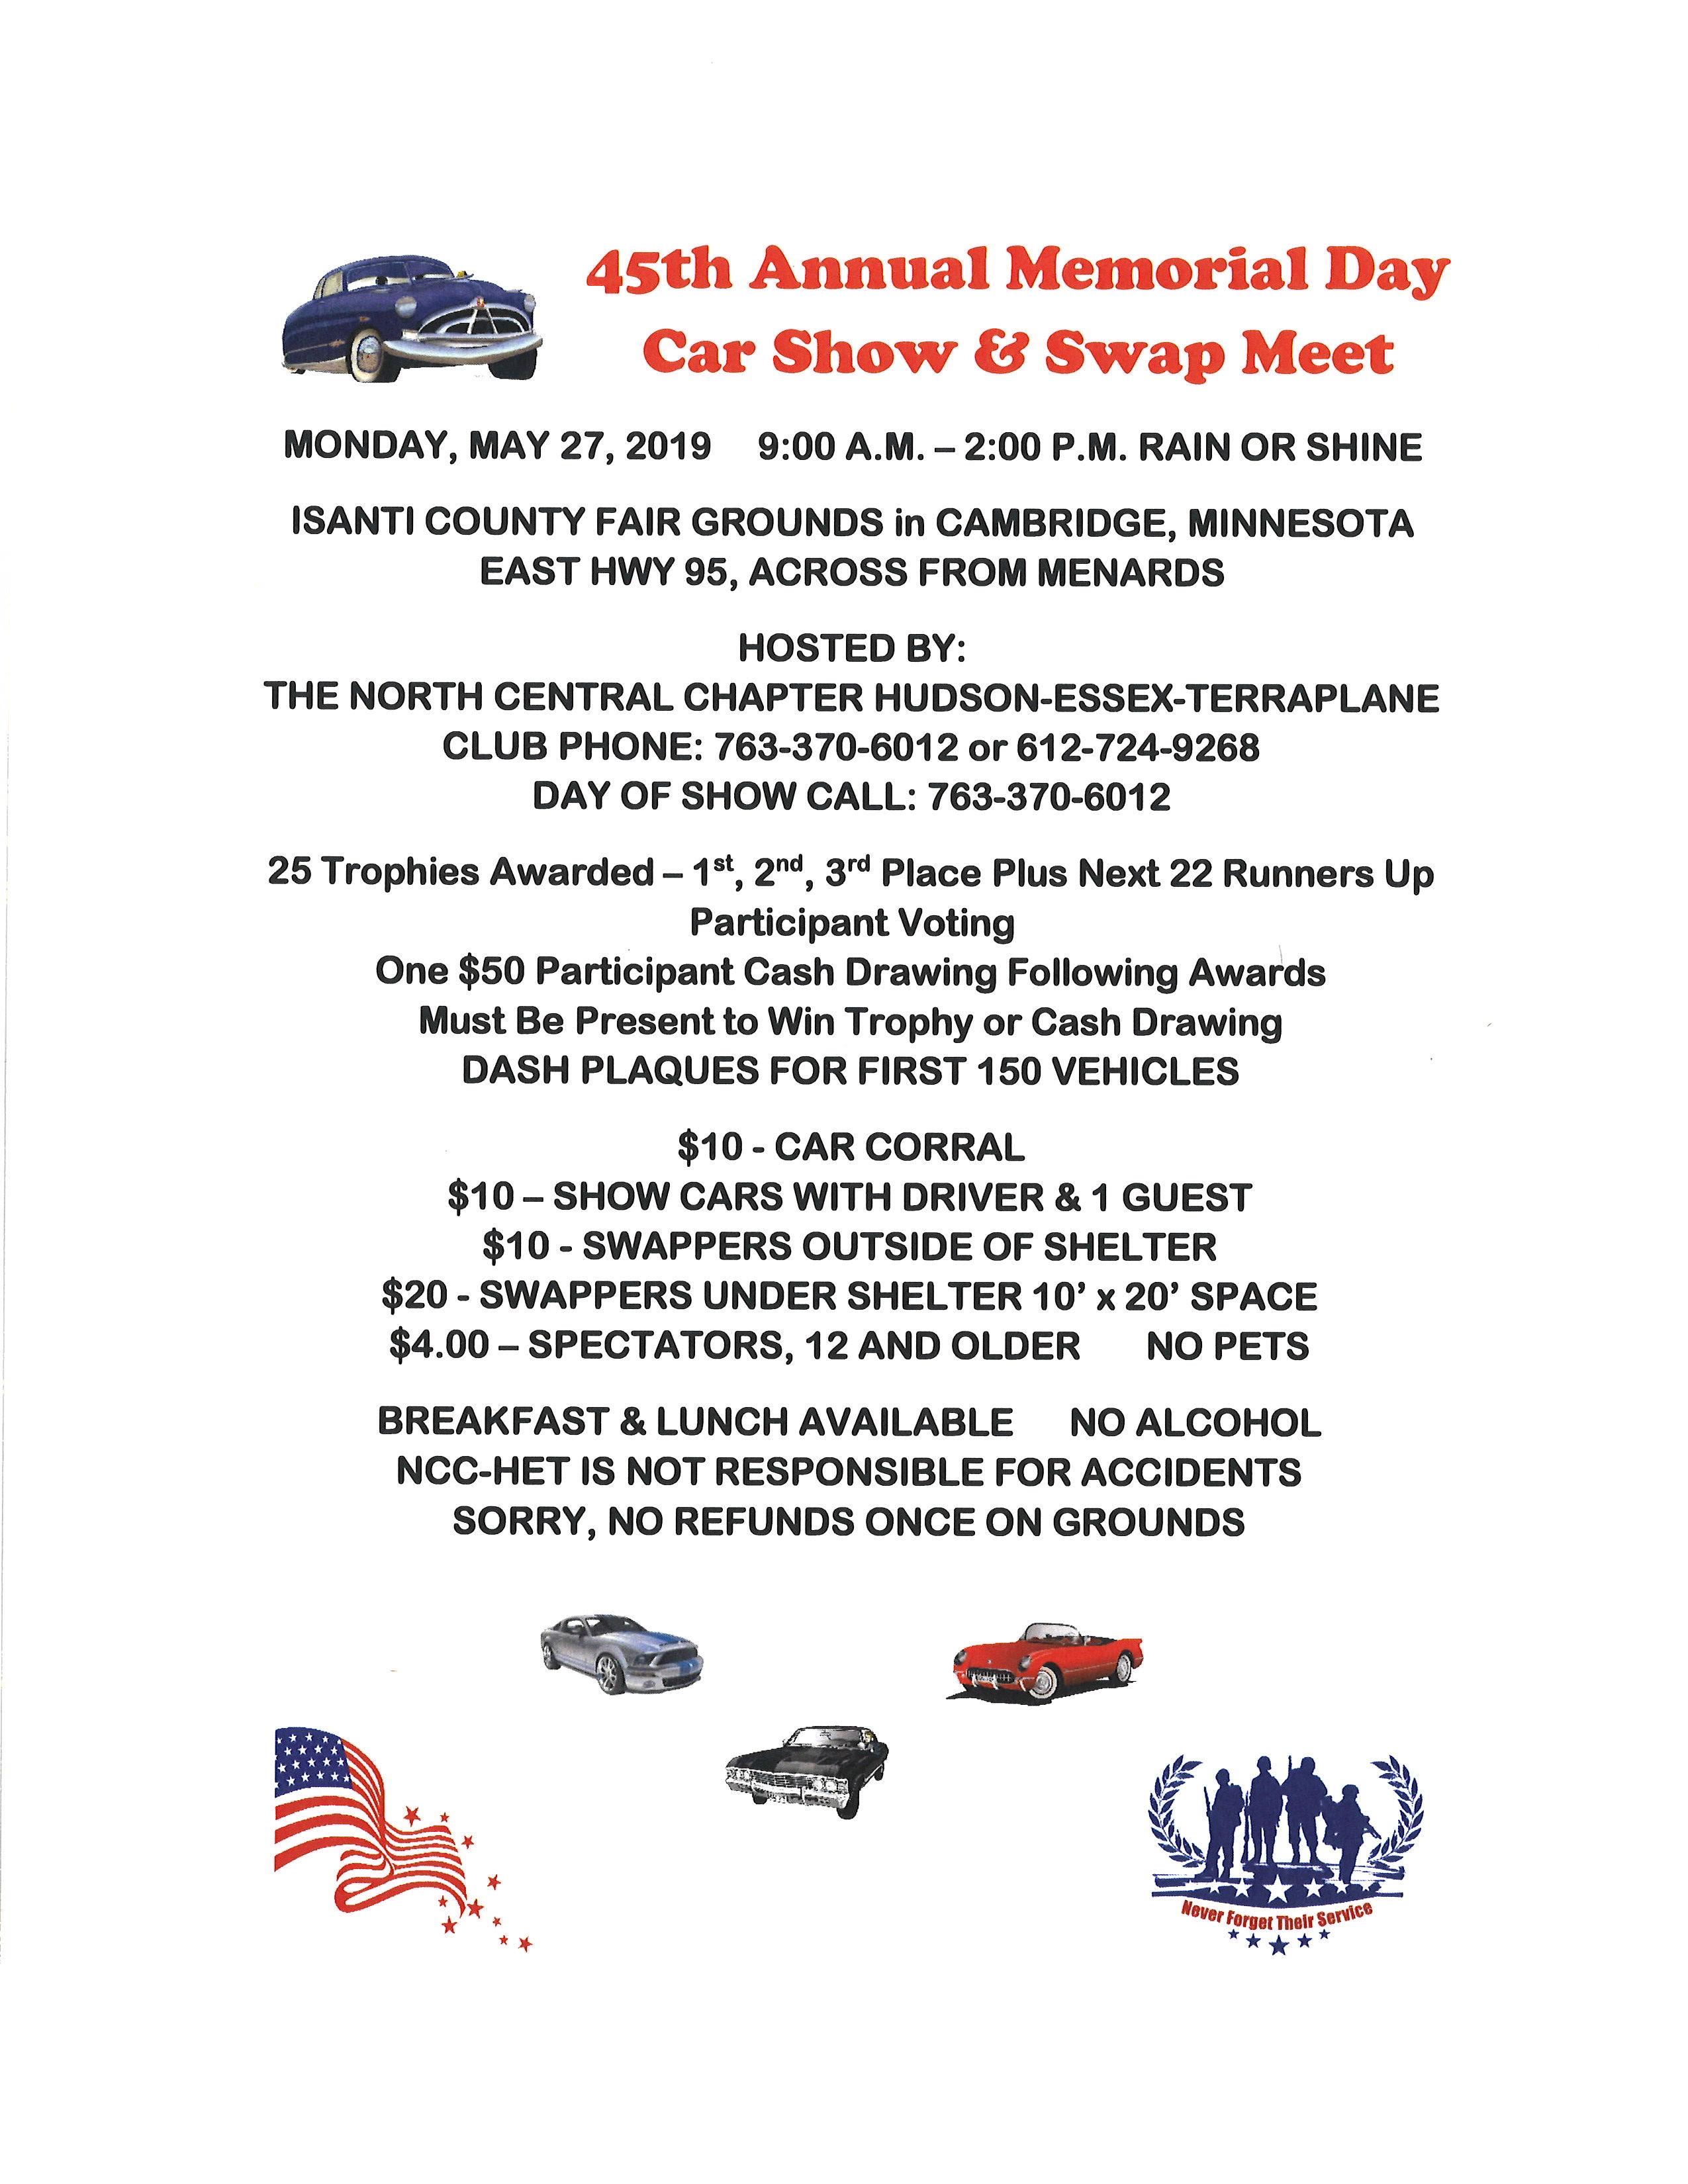 Isanti county fair 2019